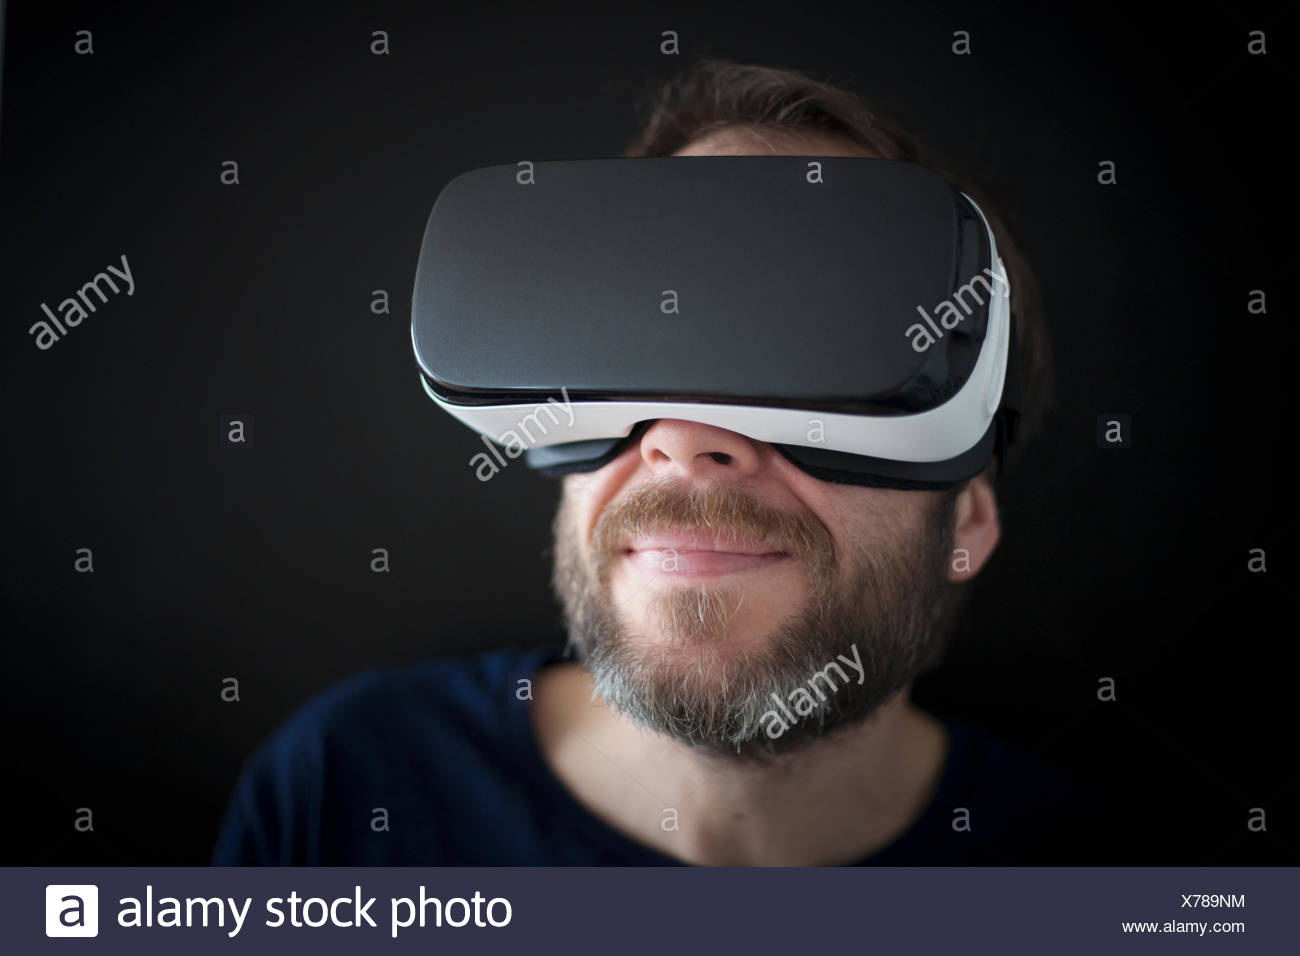 Smiling man wearing Virtual Reality Glasses - Stock Image